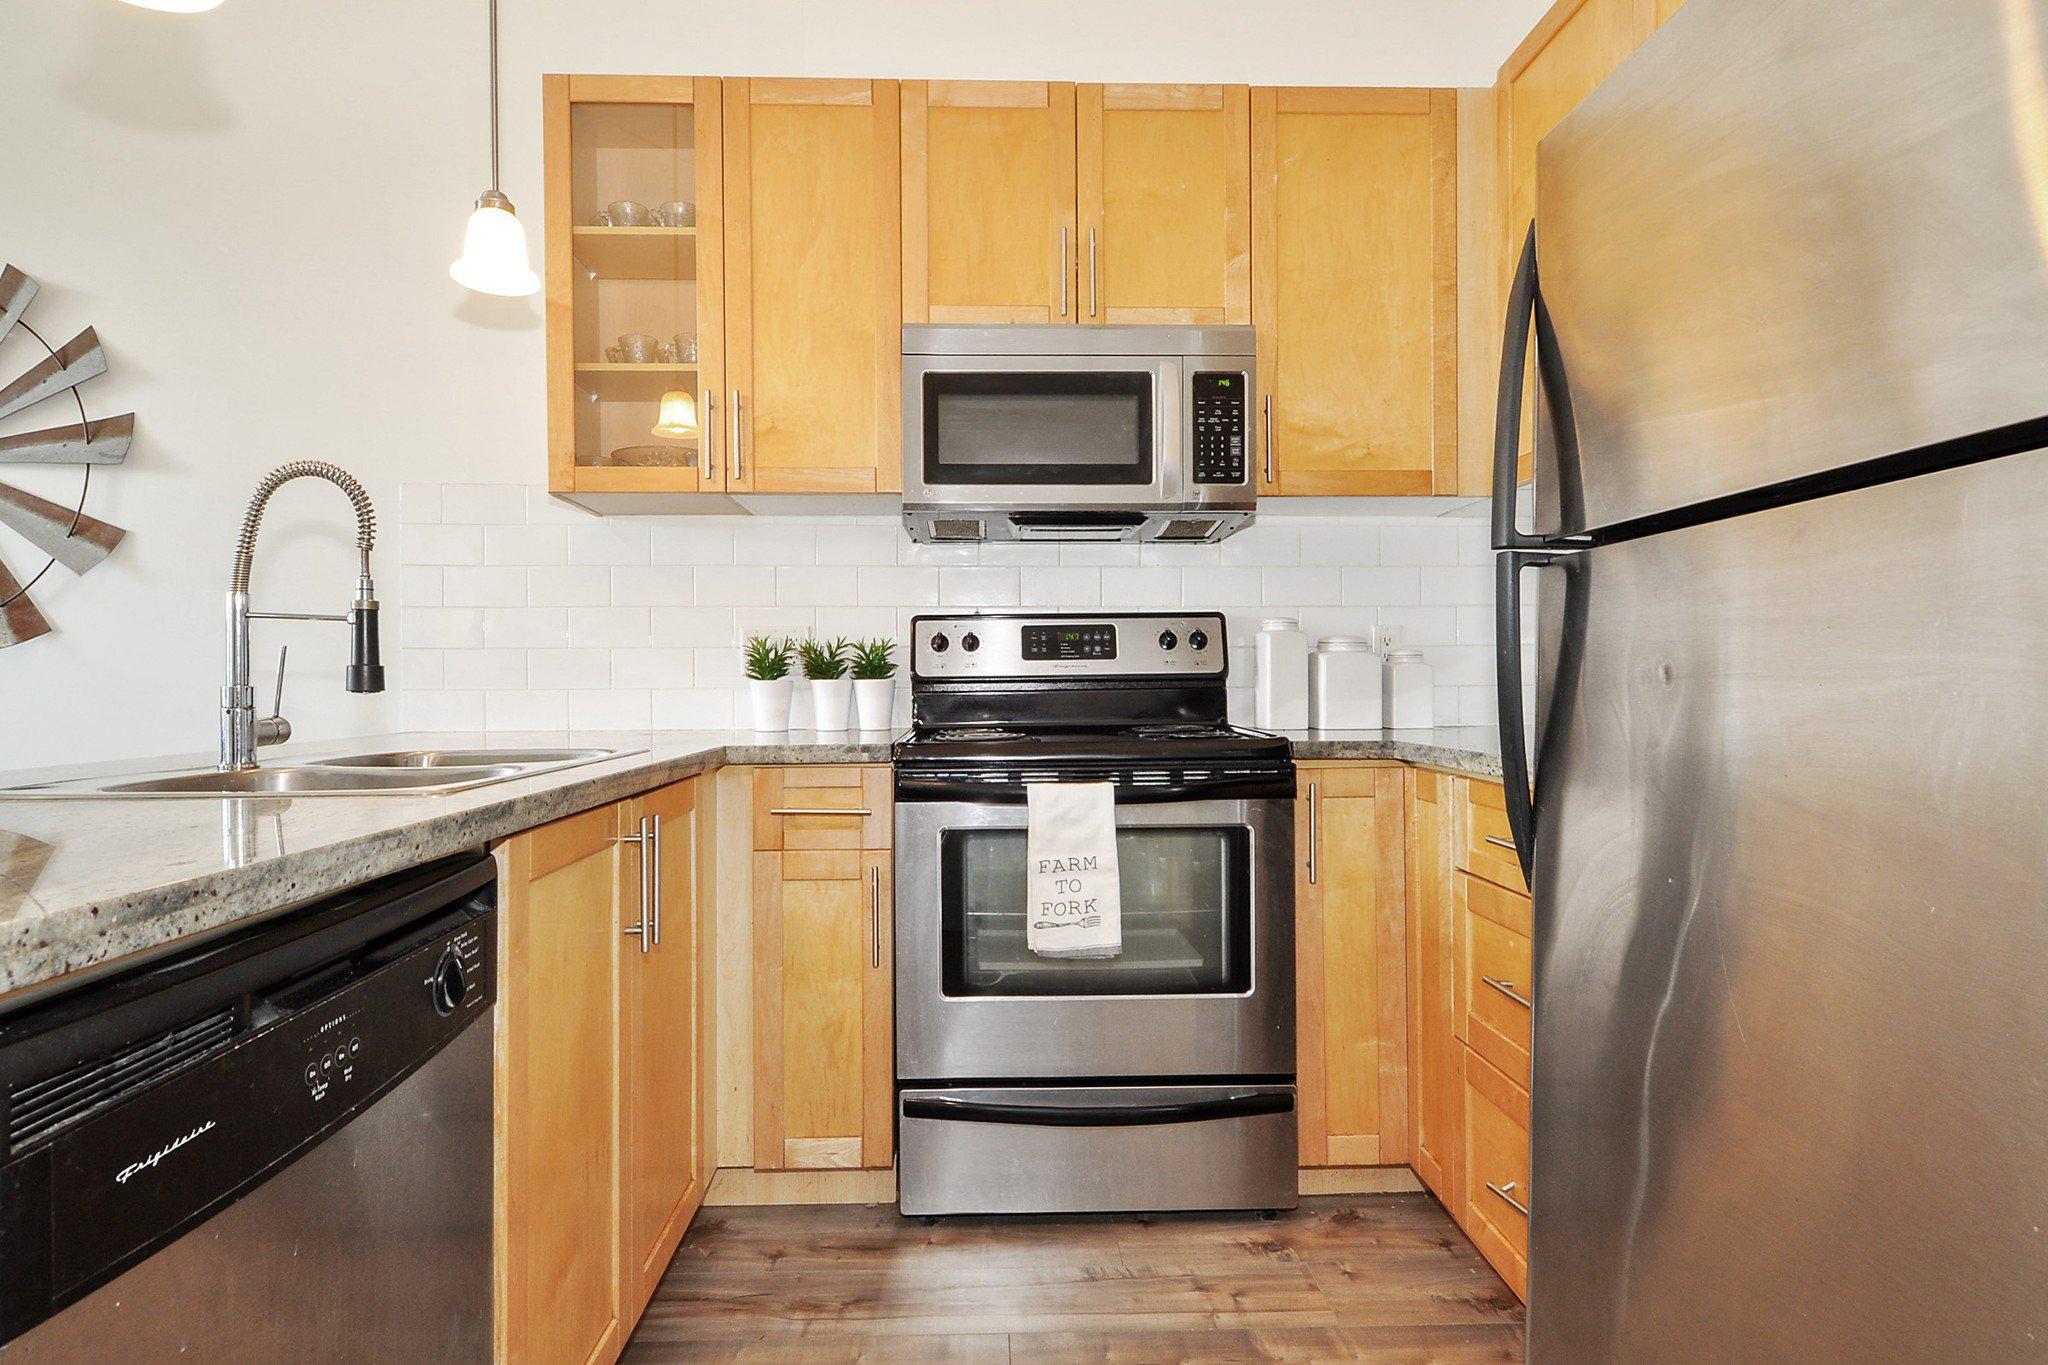 "Photo 8: Photos: 302 688 E 17TH Avenue in Vancouver: Fraser VE Condo for sale in ""MONDELLA"" (Vancouver East)  : MLS®# R2403902"